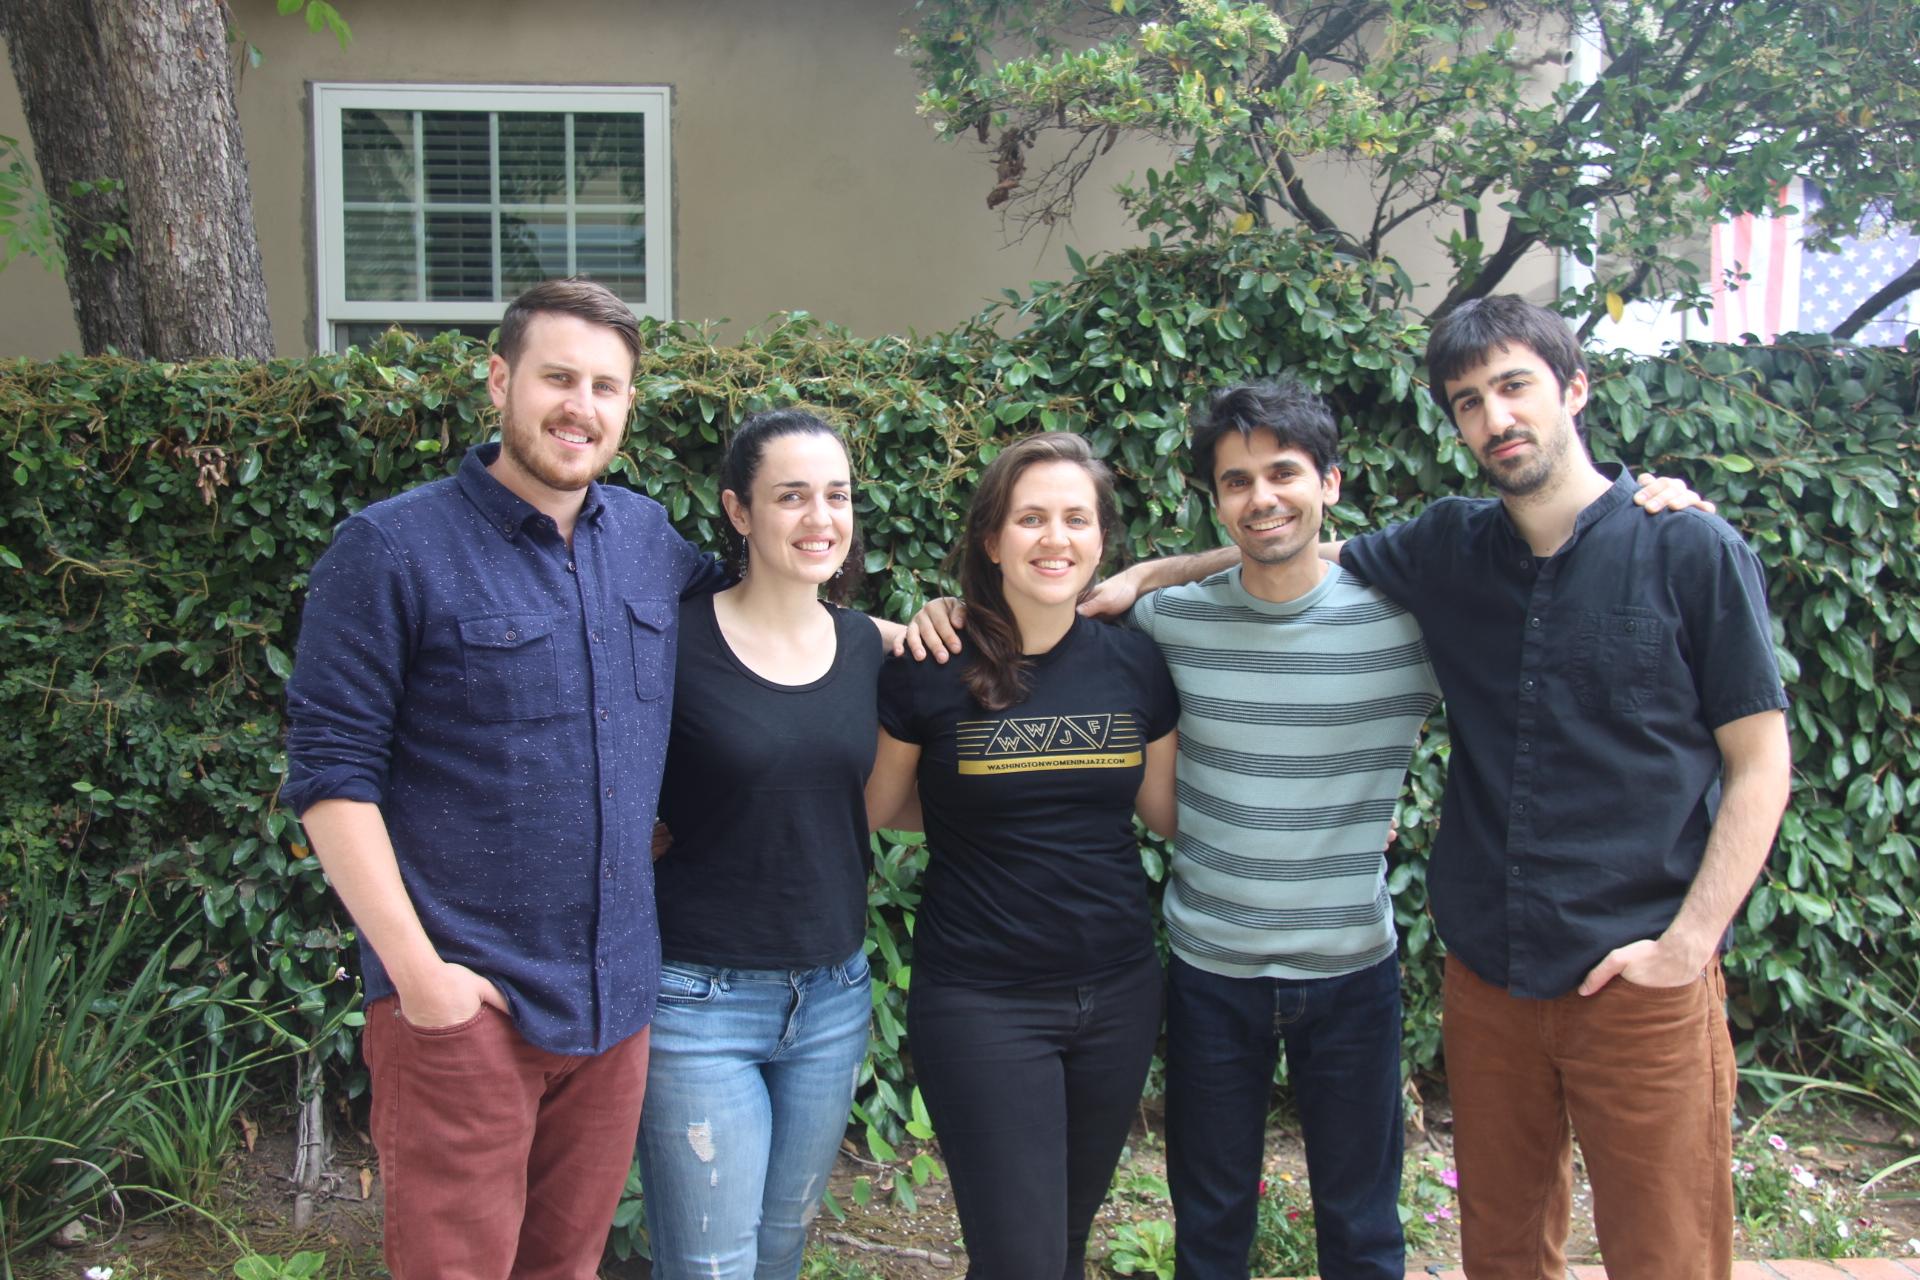 Aaron Janik, Ana Barreiro, Amy K Bormet, Sezin Ahmet Türkmenoglu, David Wise